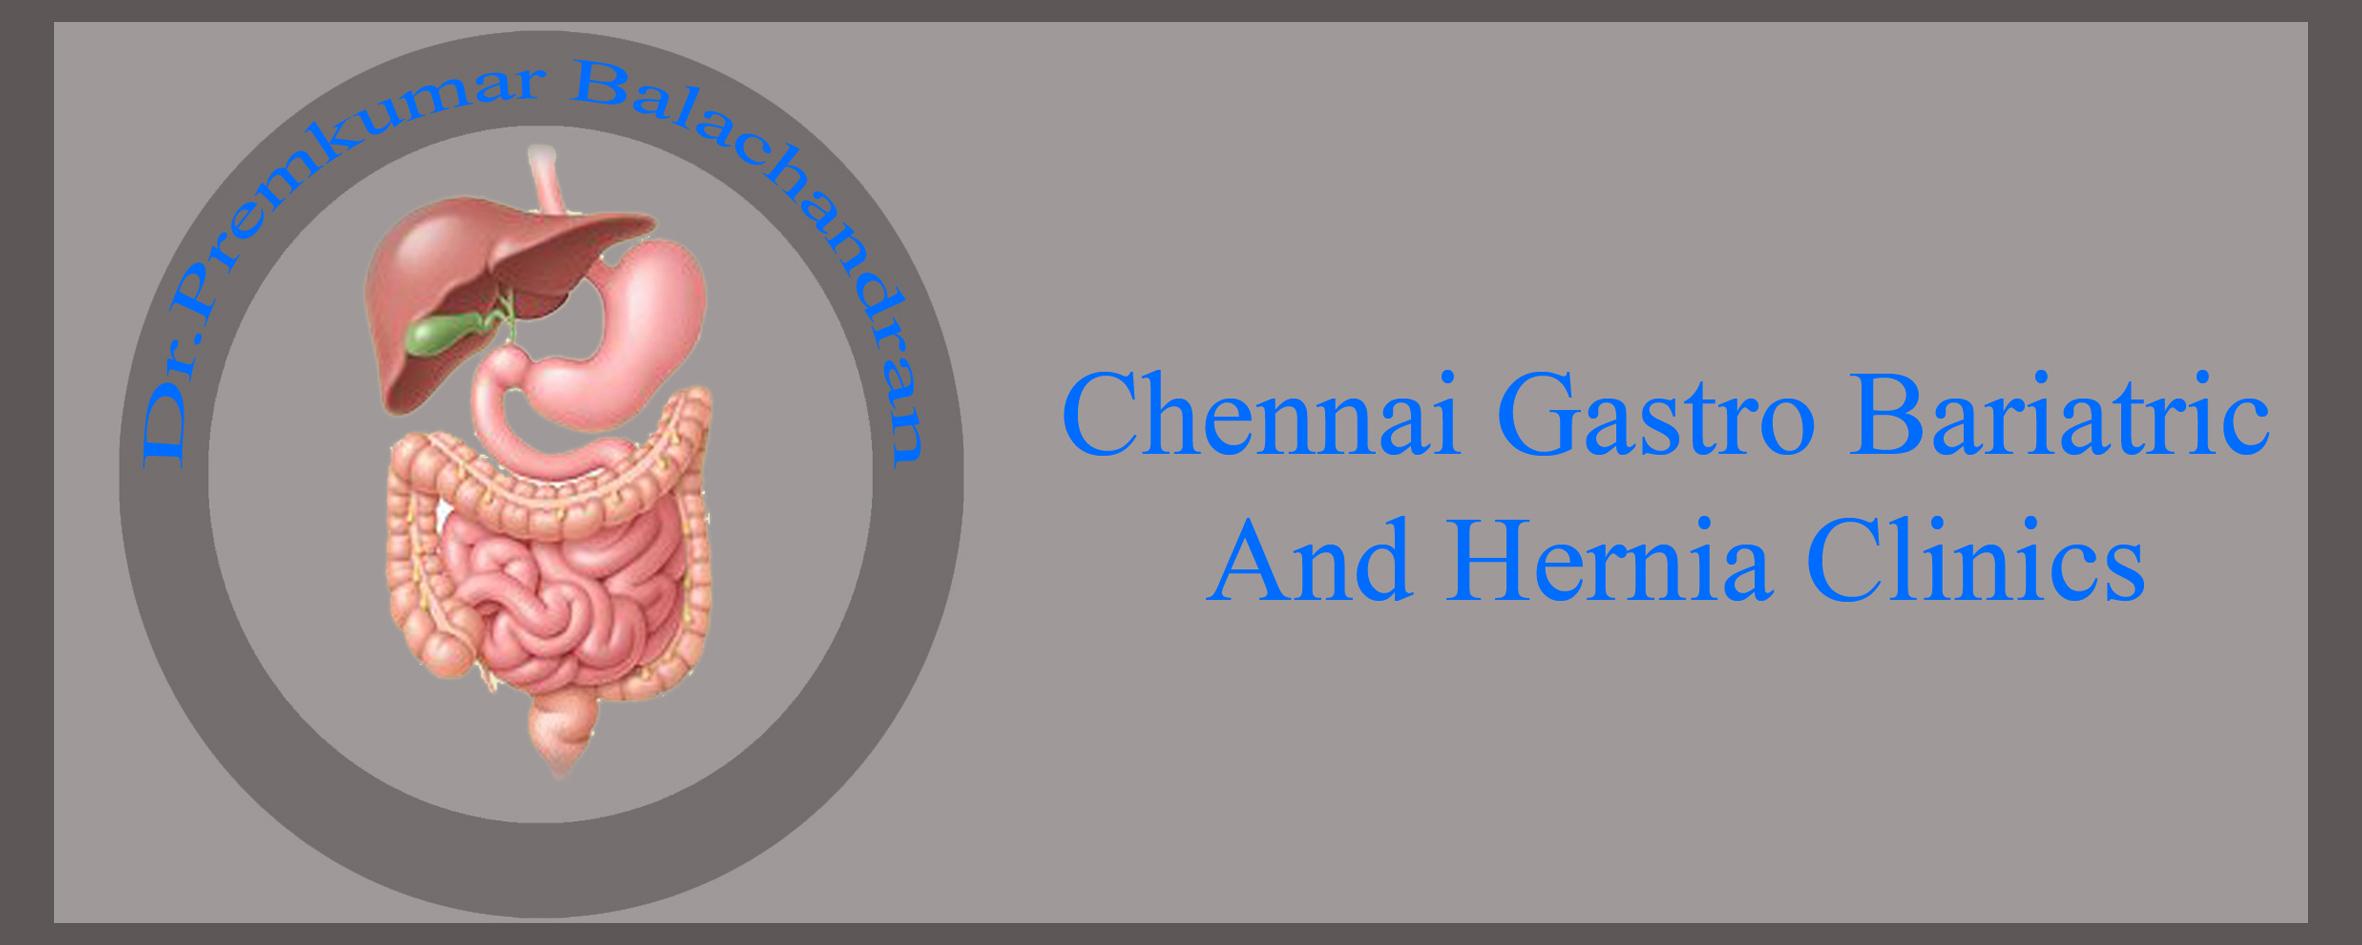 Gastro - Bariatric-Hernia Speciality Clinic